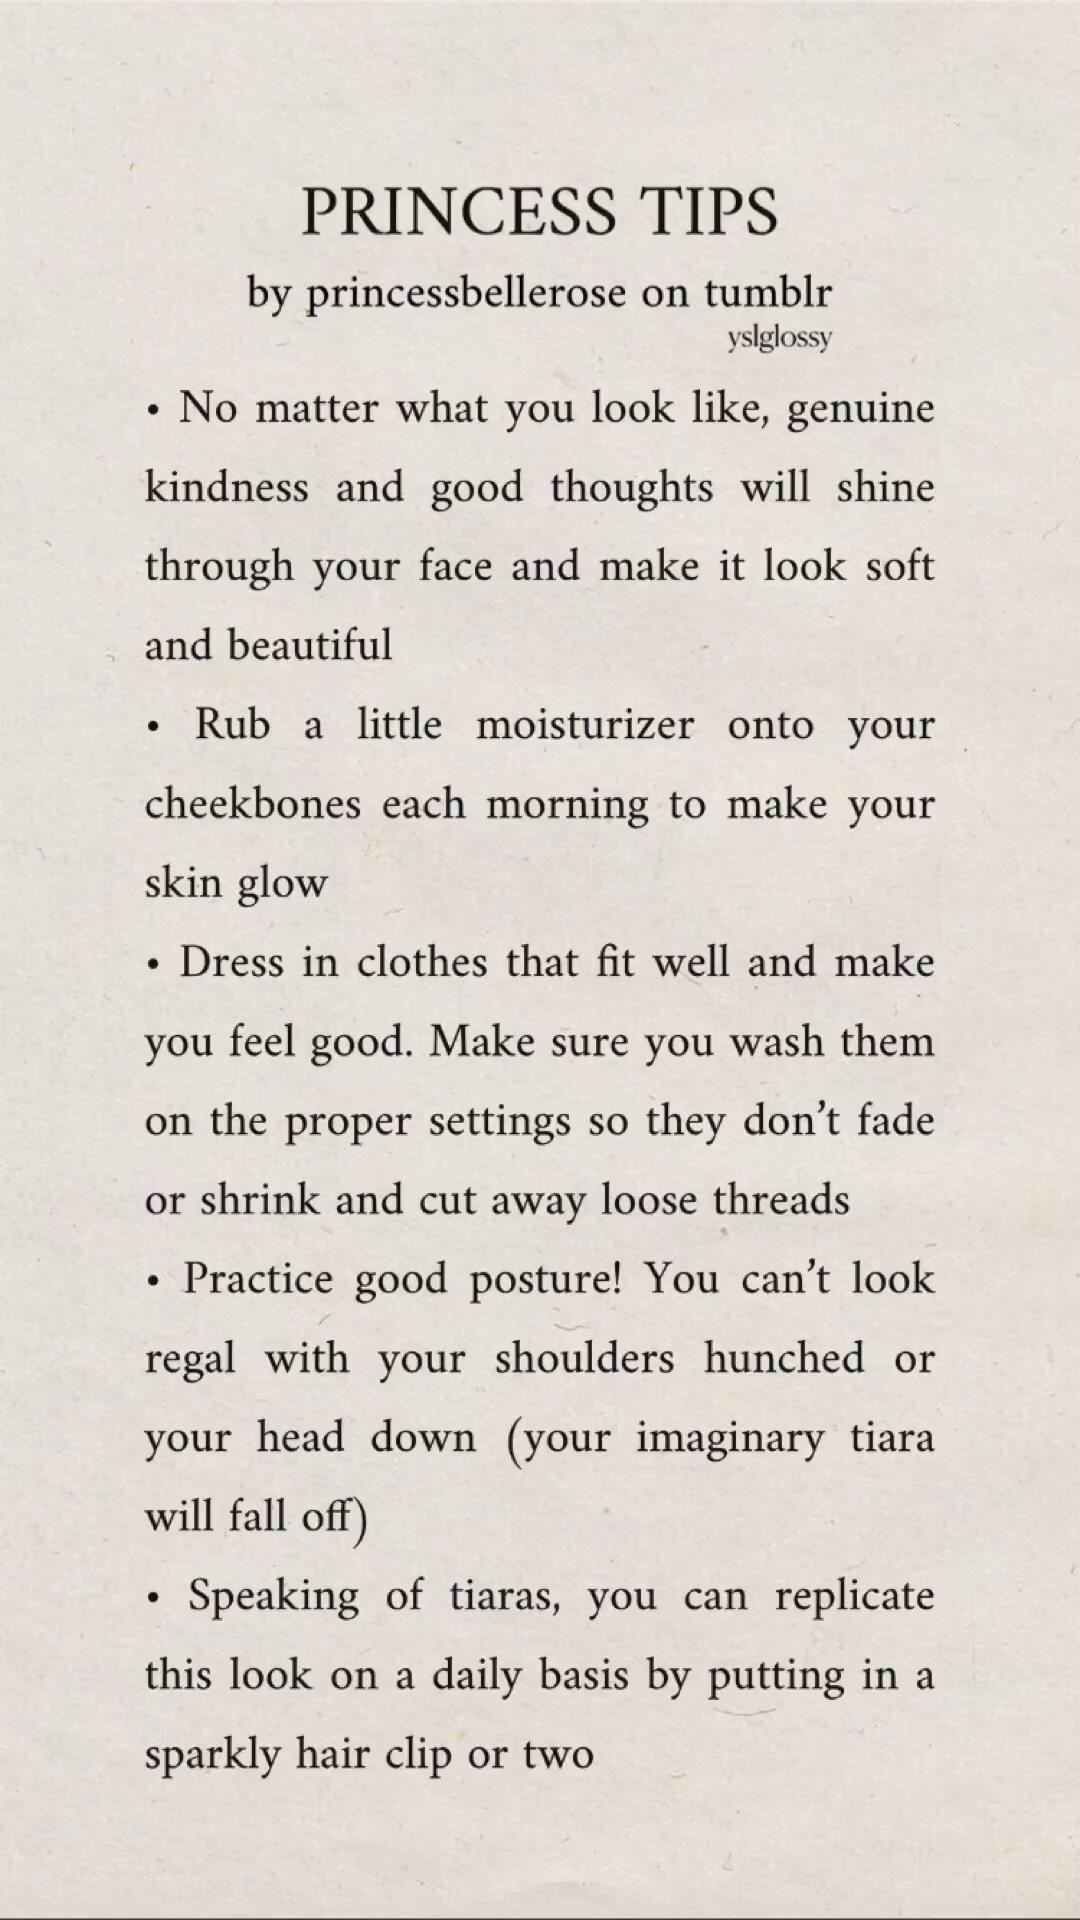 PRINCESS TIPS (by princessbellerose on tumblr)